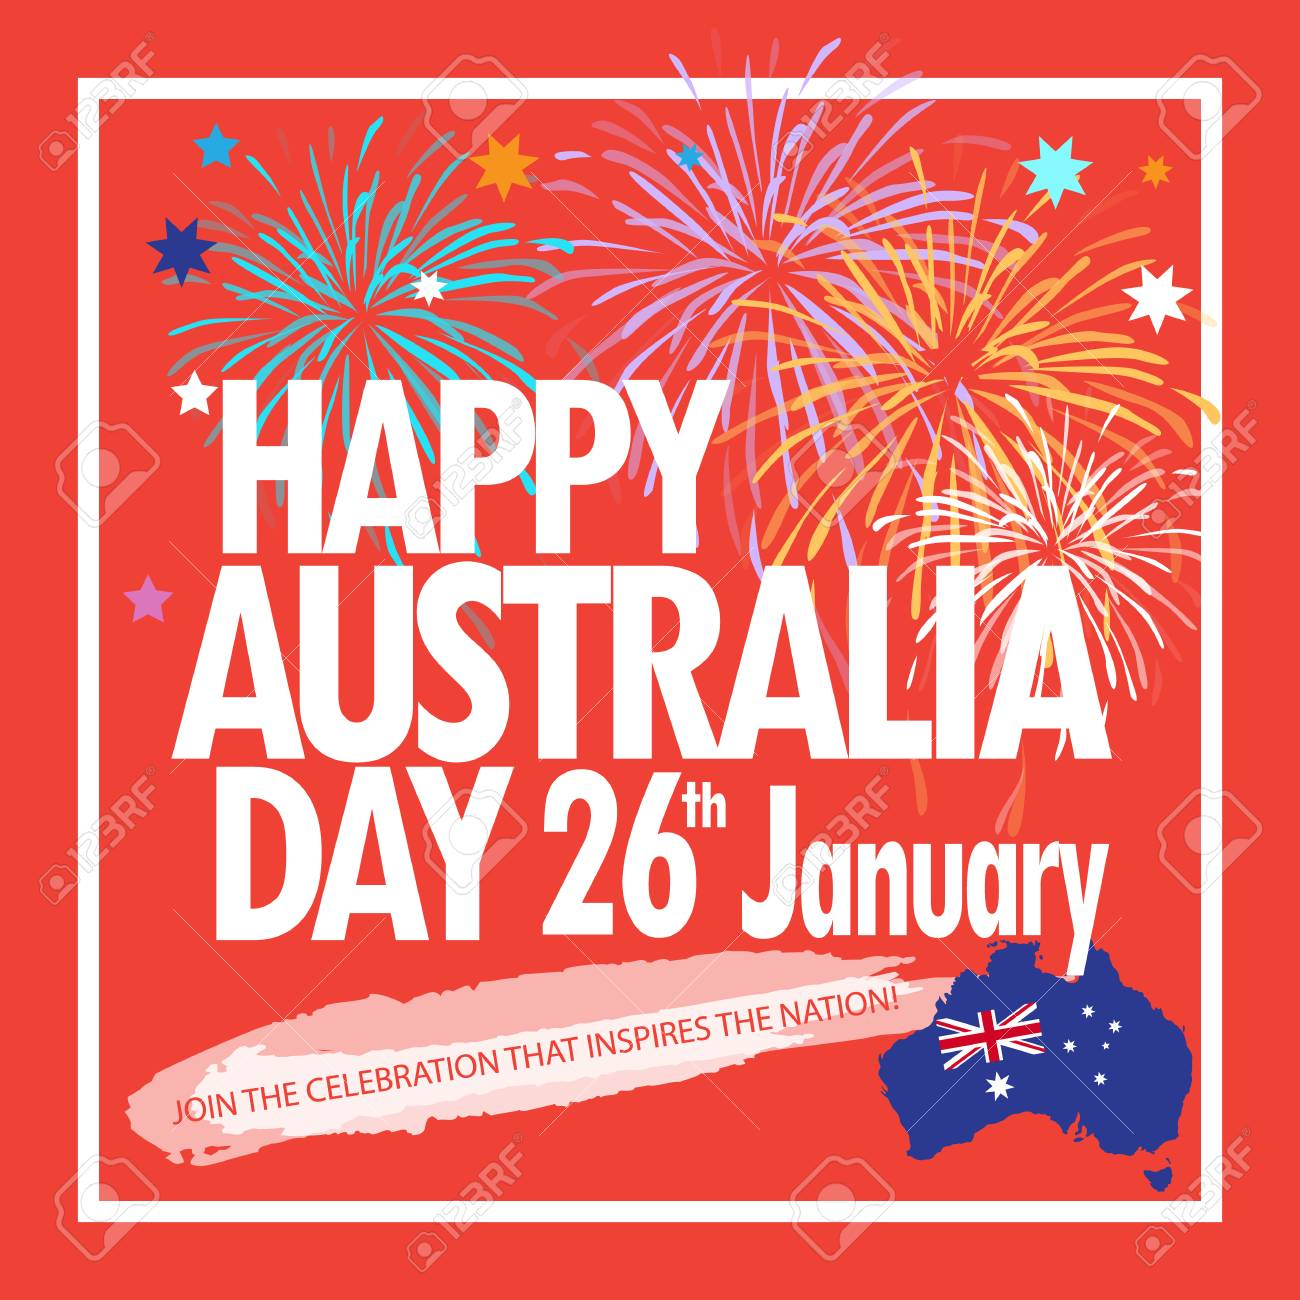 Australia Map Poster.Happy Australia Day 26th January Inscription Poster With Australia